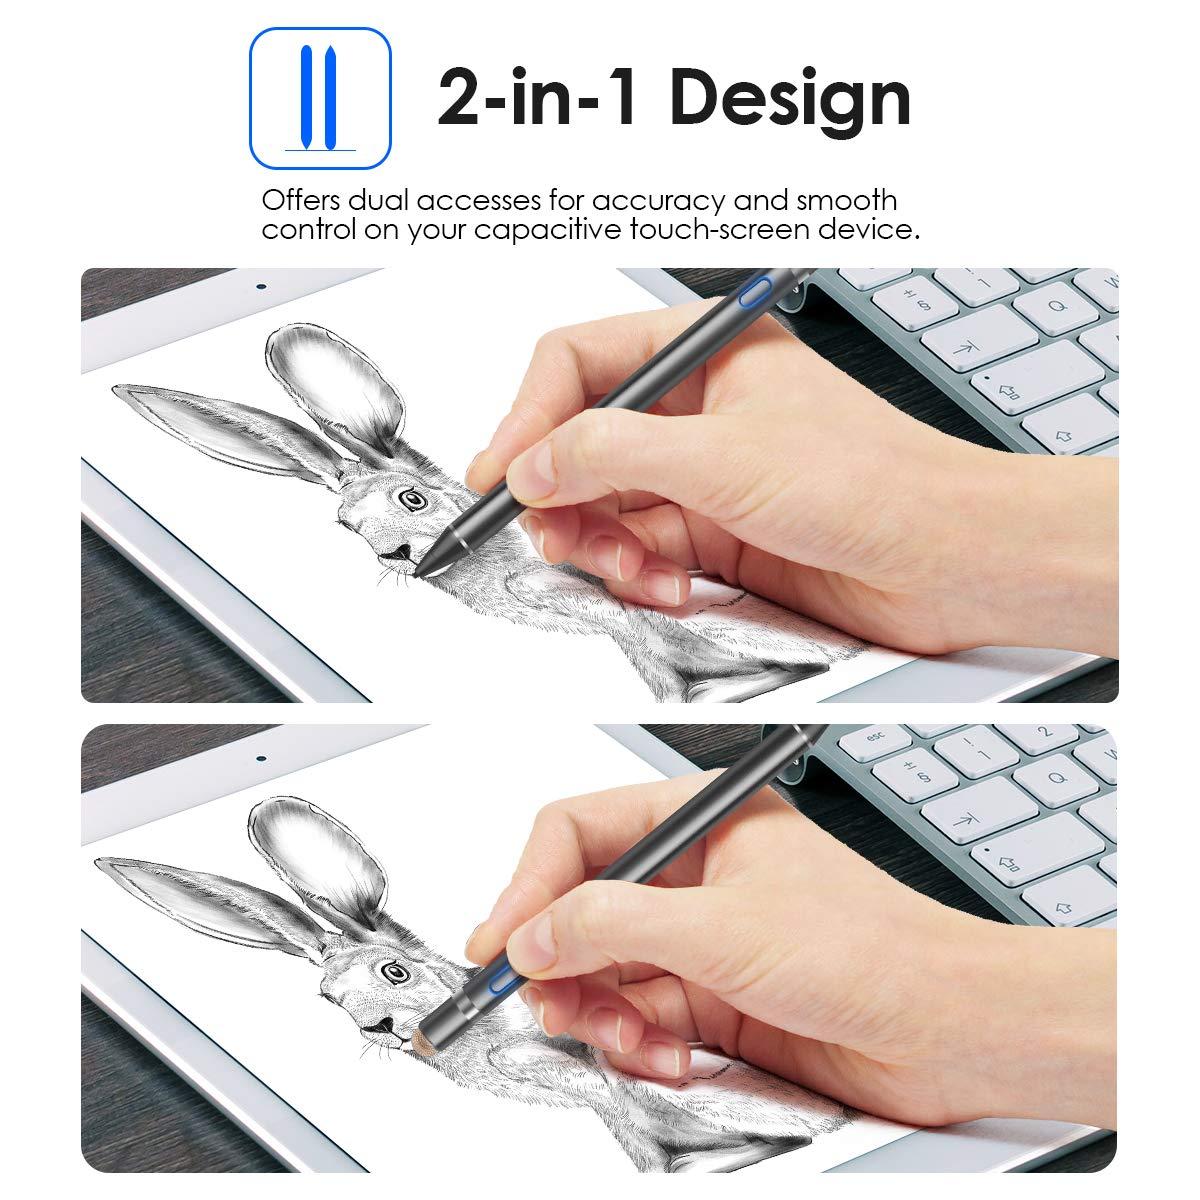 Negro ROVLAK Lapiz T/áctil Capacitivo 2 en 1 Lapiz Capacitivo Punta Fina 1,5 mm Movil Stylus Pen Recargable L/ápiz T/áctil Activo para iPhone iPad Android Tel/éfonos M/óviles de Tablet